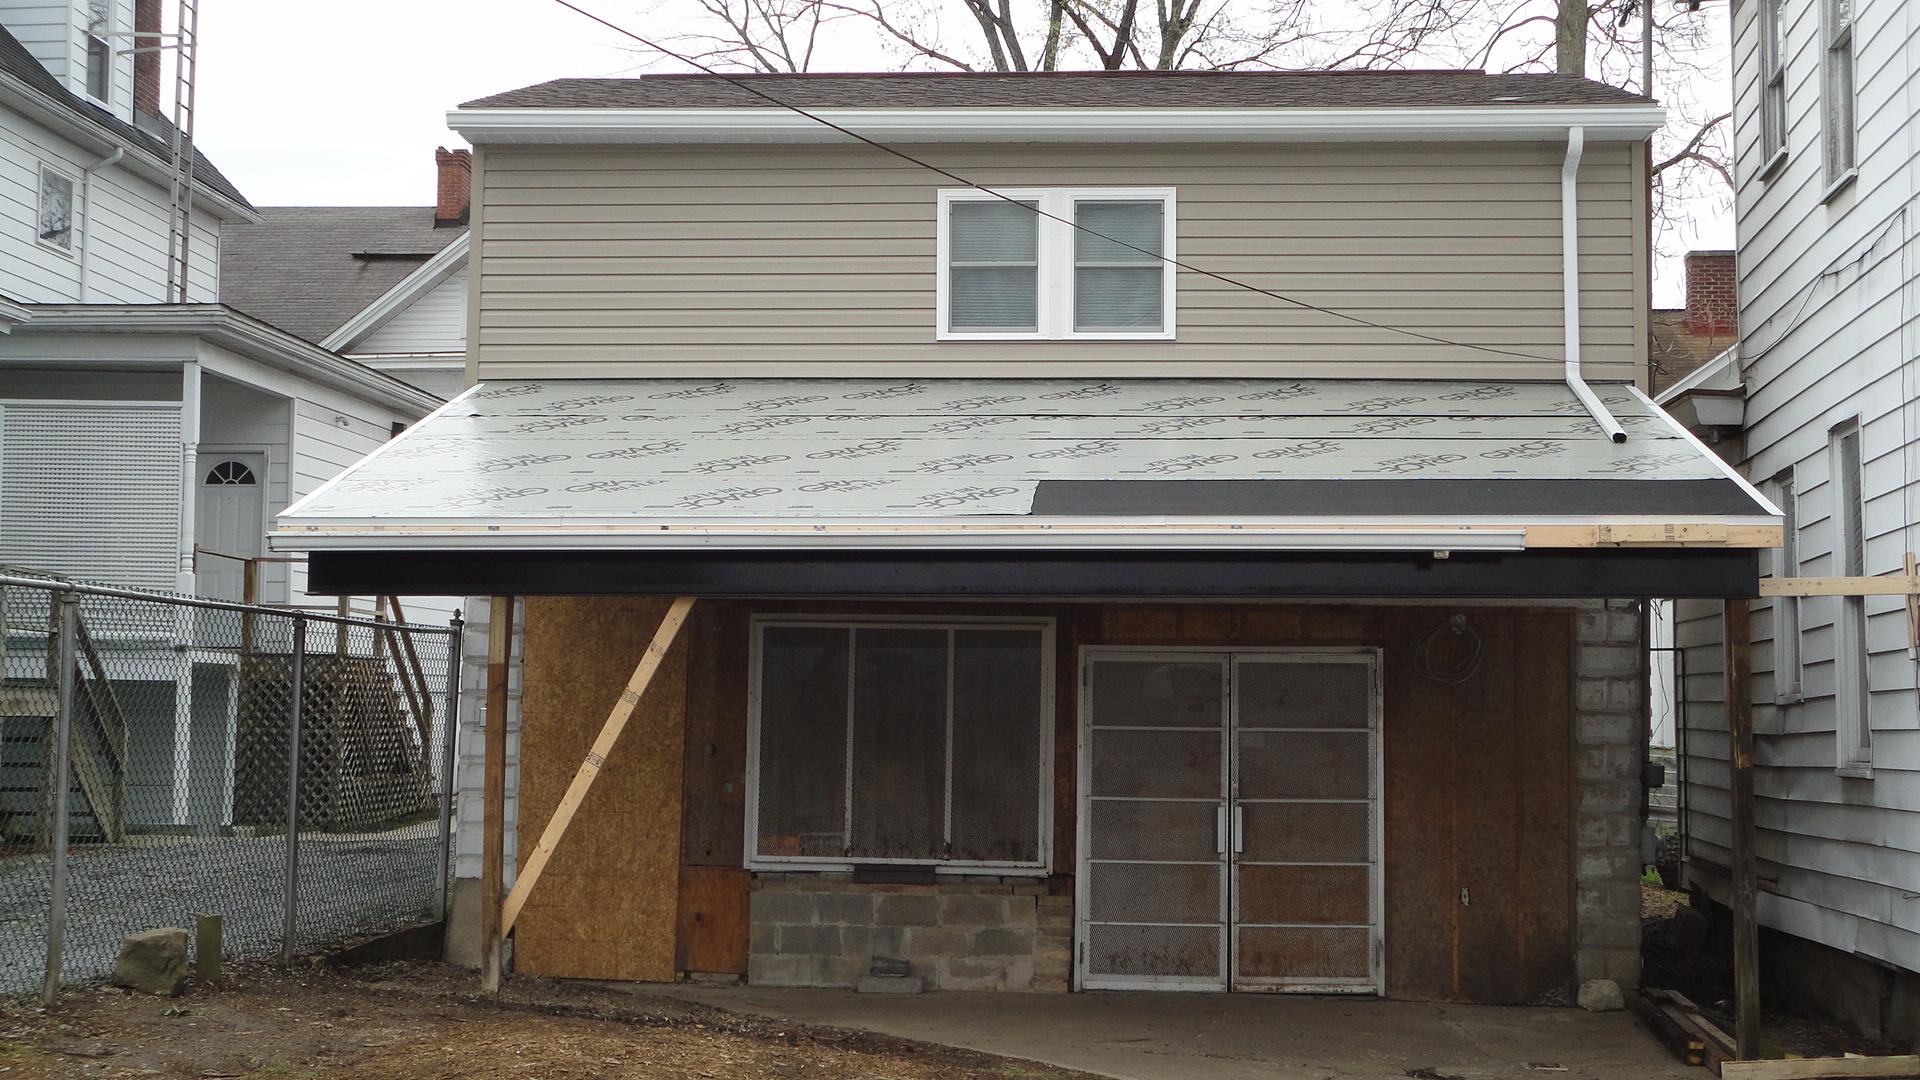 Modular homes morgantown wv 18 photos properties g g for Home builders morgantown wv